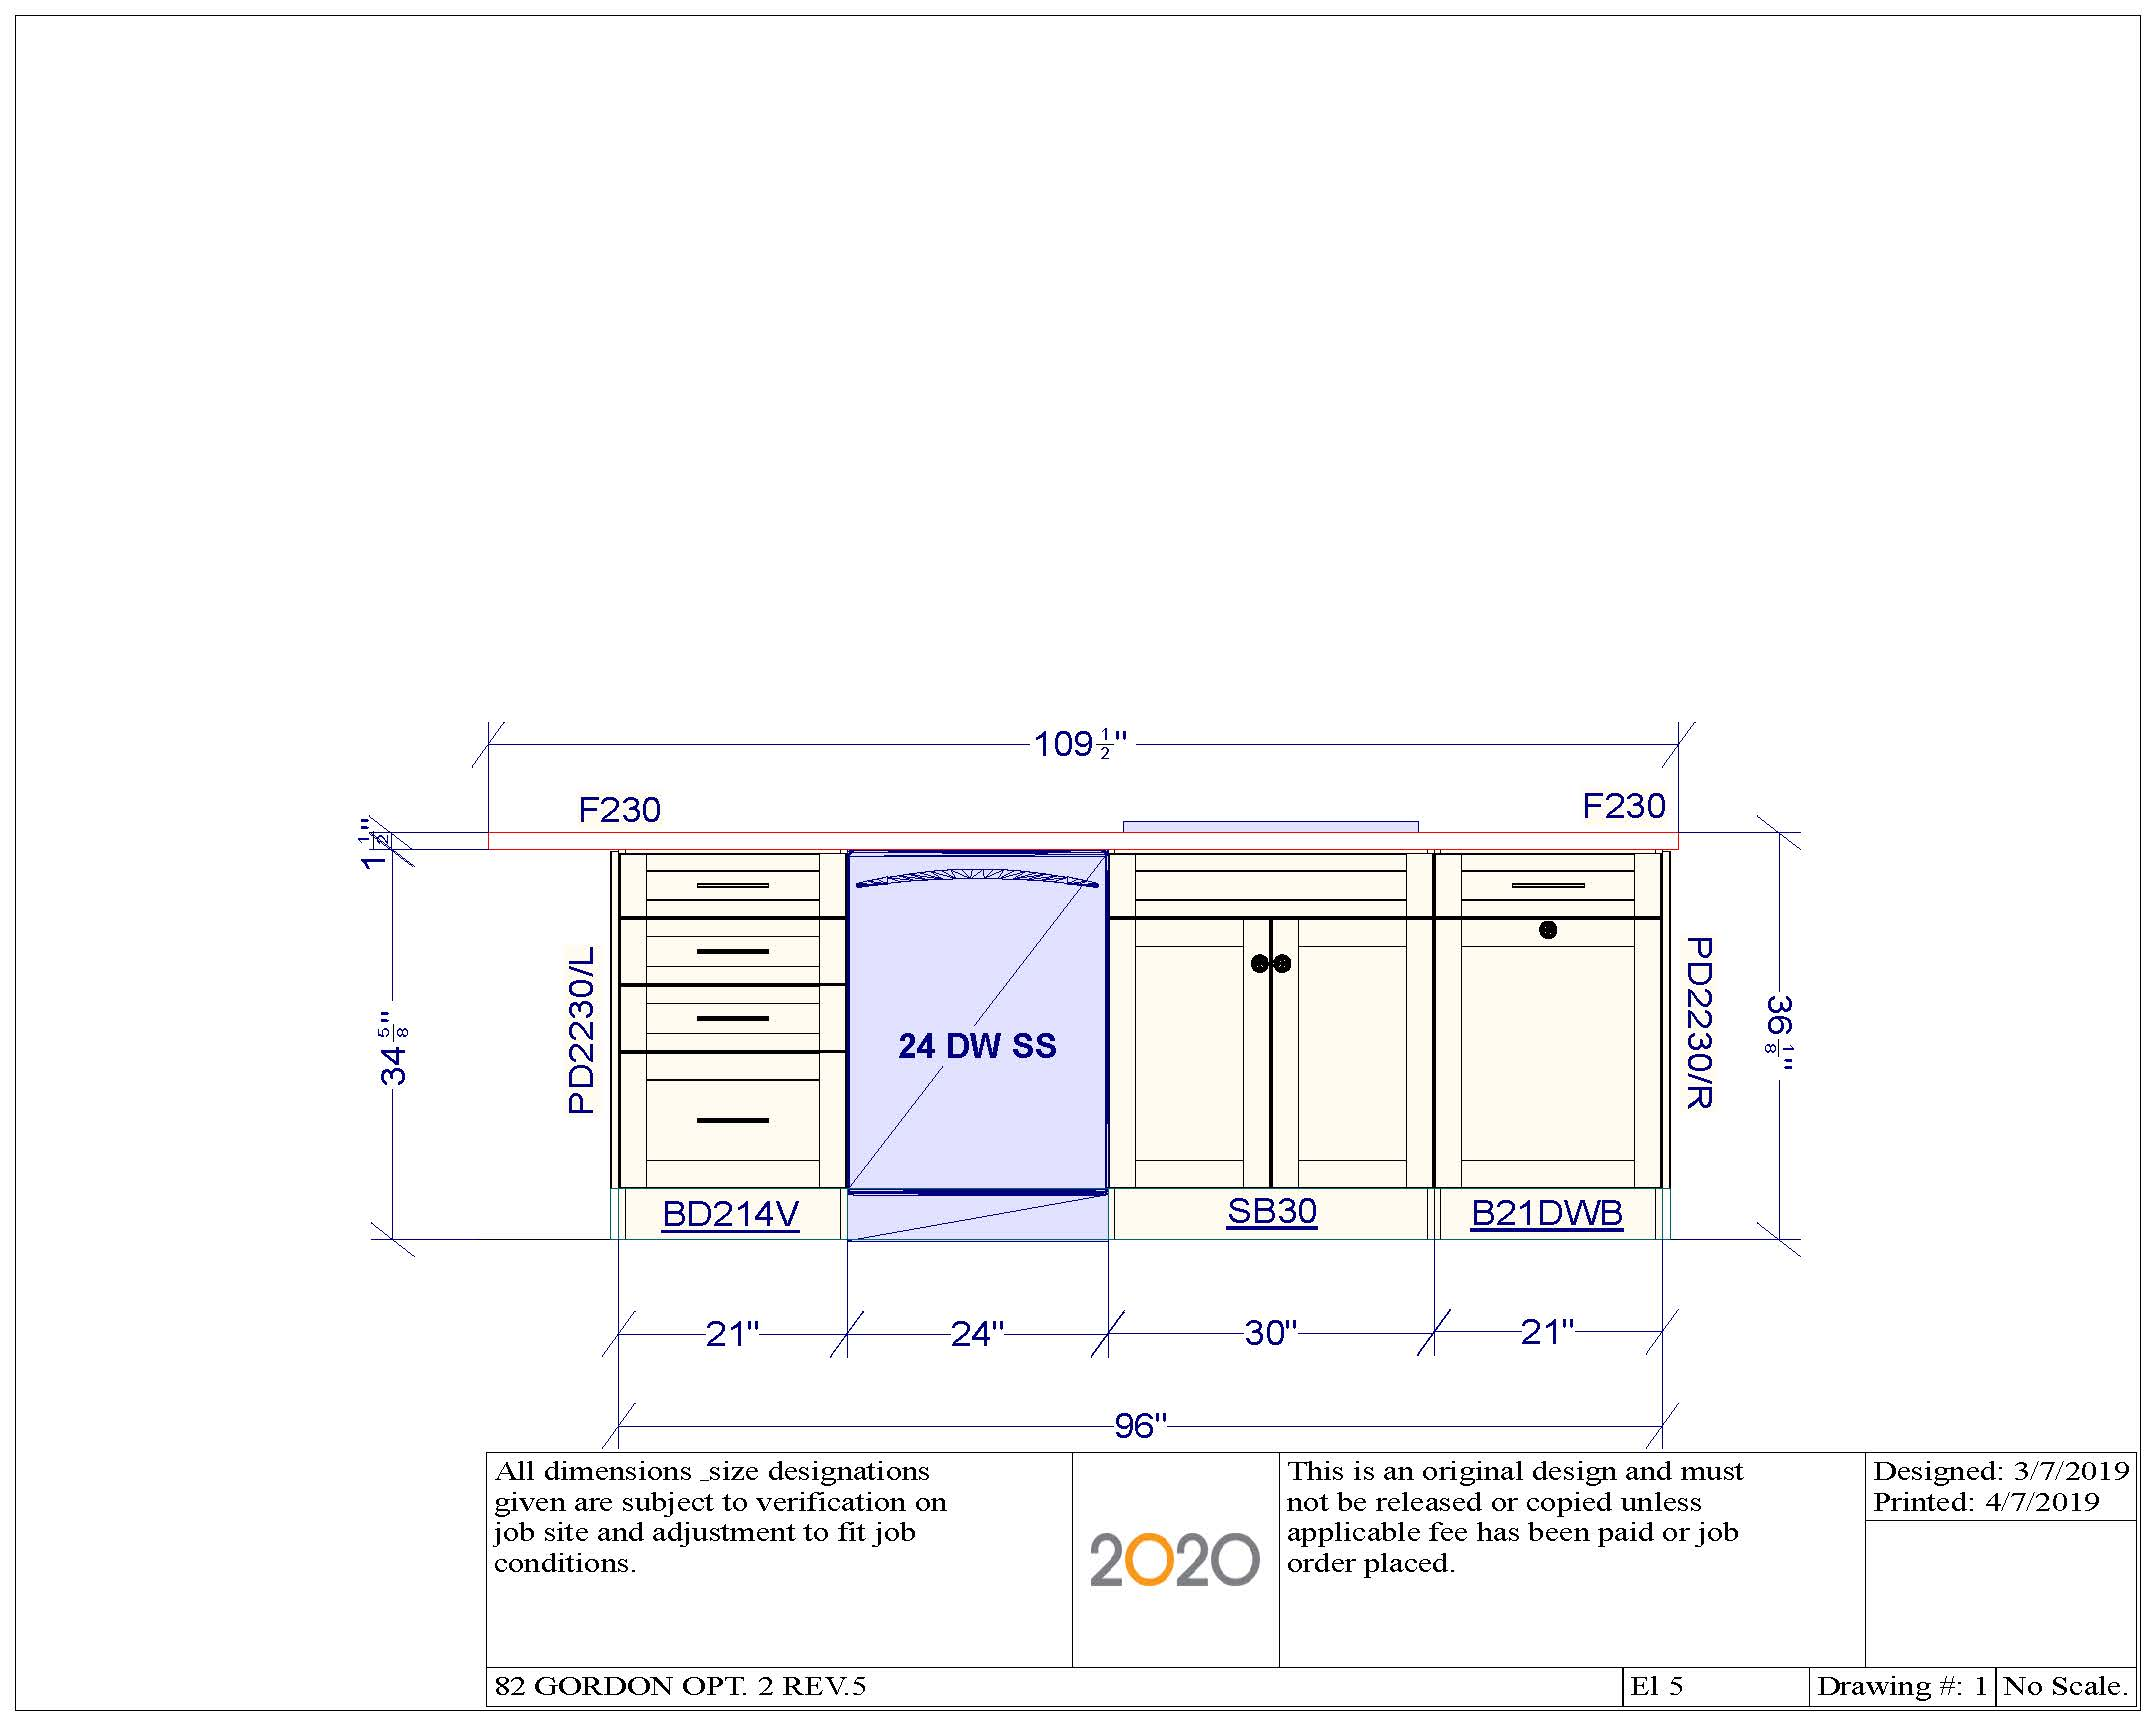 82 GORDON OPT. 2 REV.5-11_Page_13